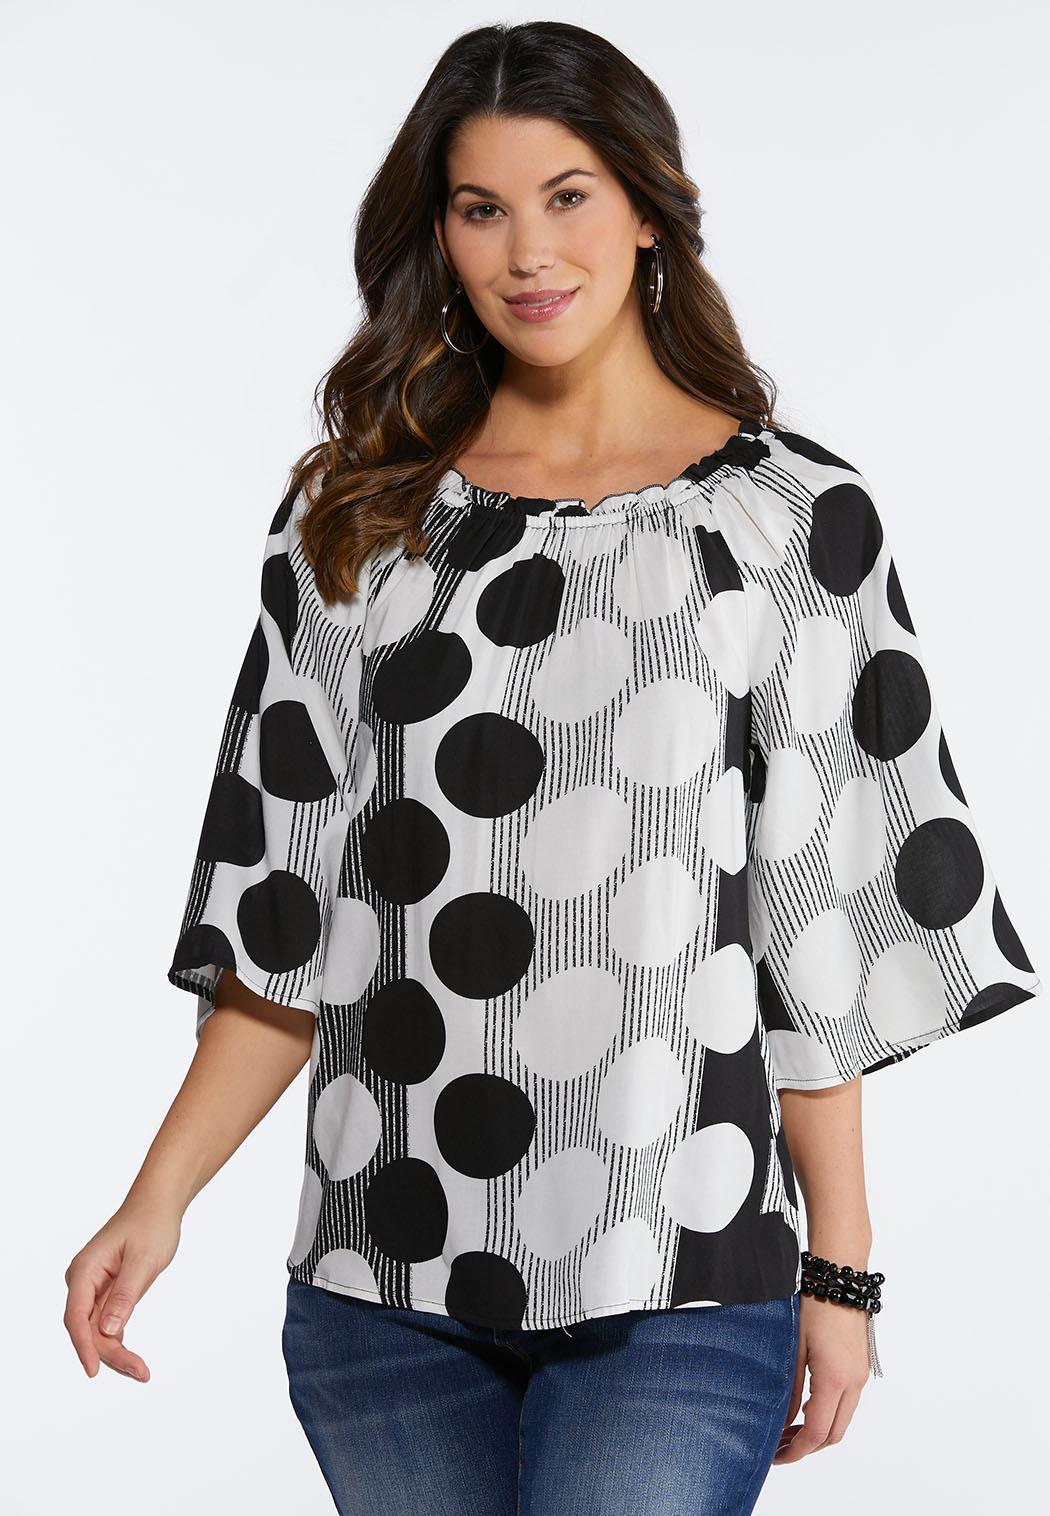 91e5c8b3f9c Plus Size Convertible Polka Dot Poet Top Shirts   Blouses Cato Fashions